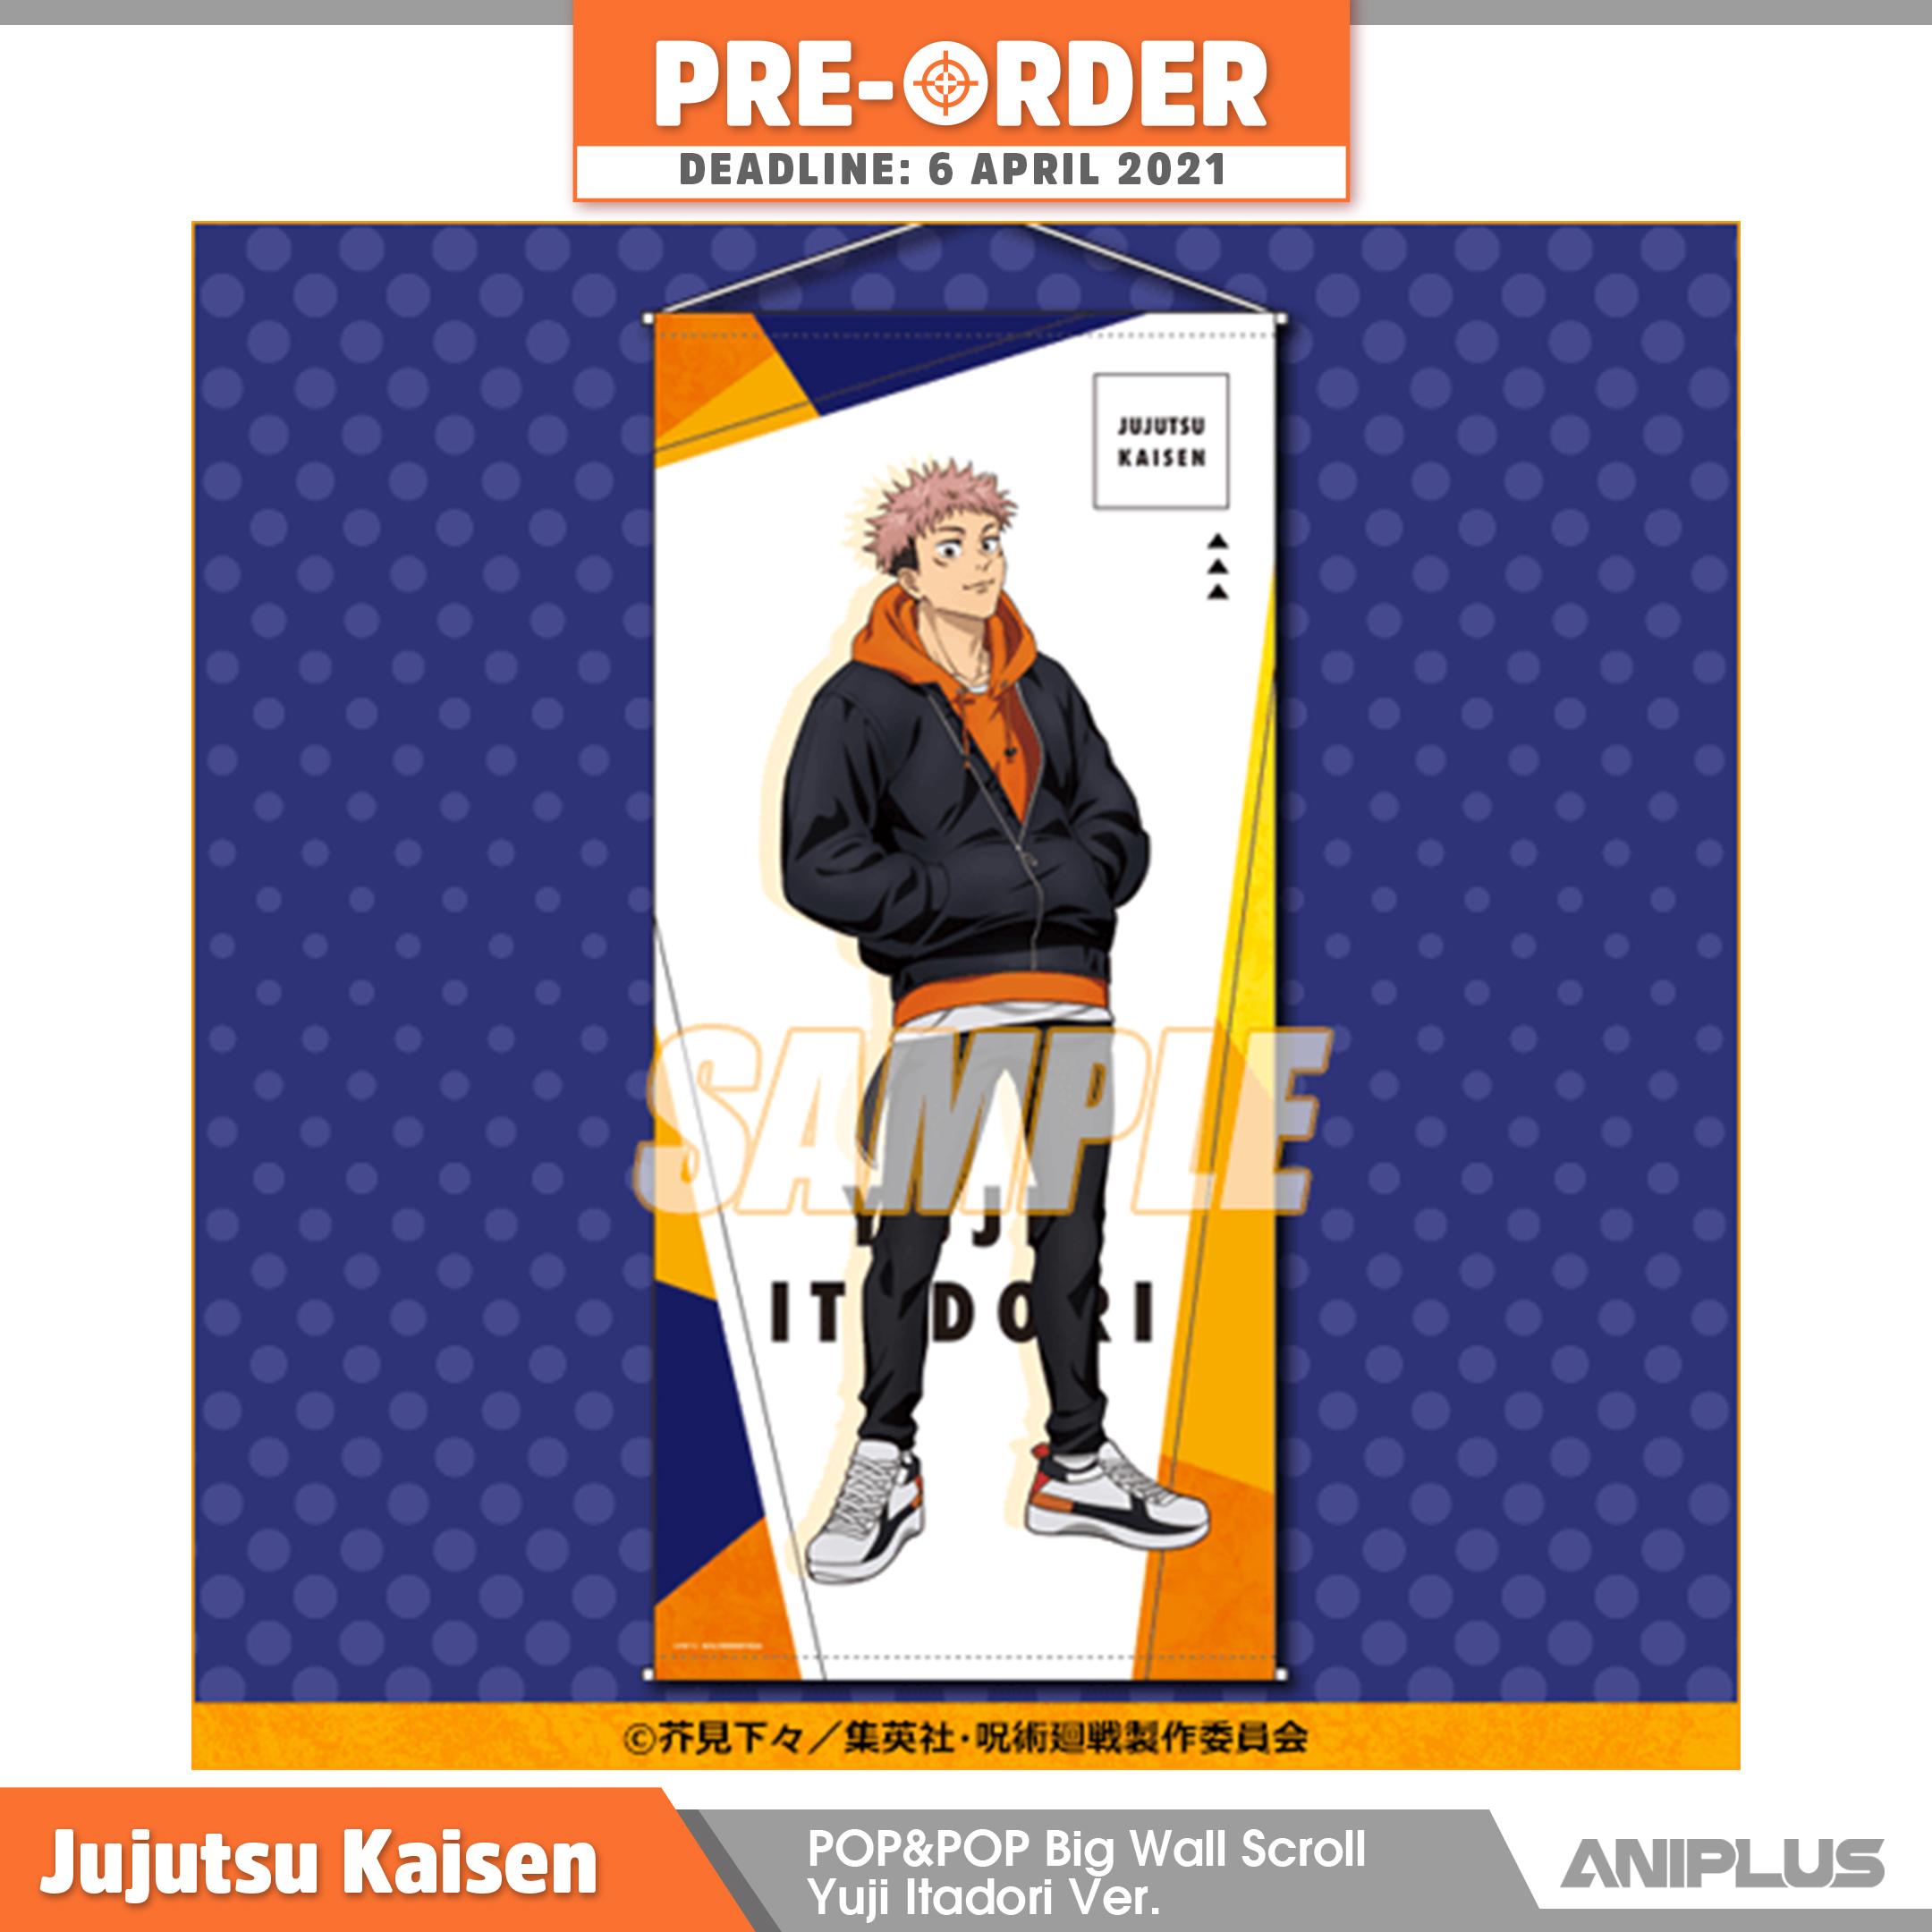 Jujutsu Kaisen POP&POP Big Wall Scroll Yuji Itadori Ver..png